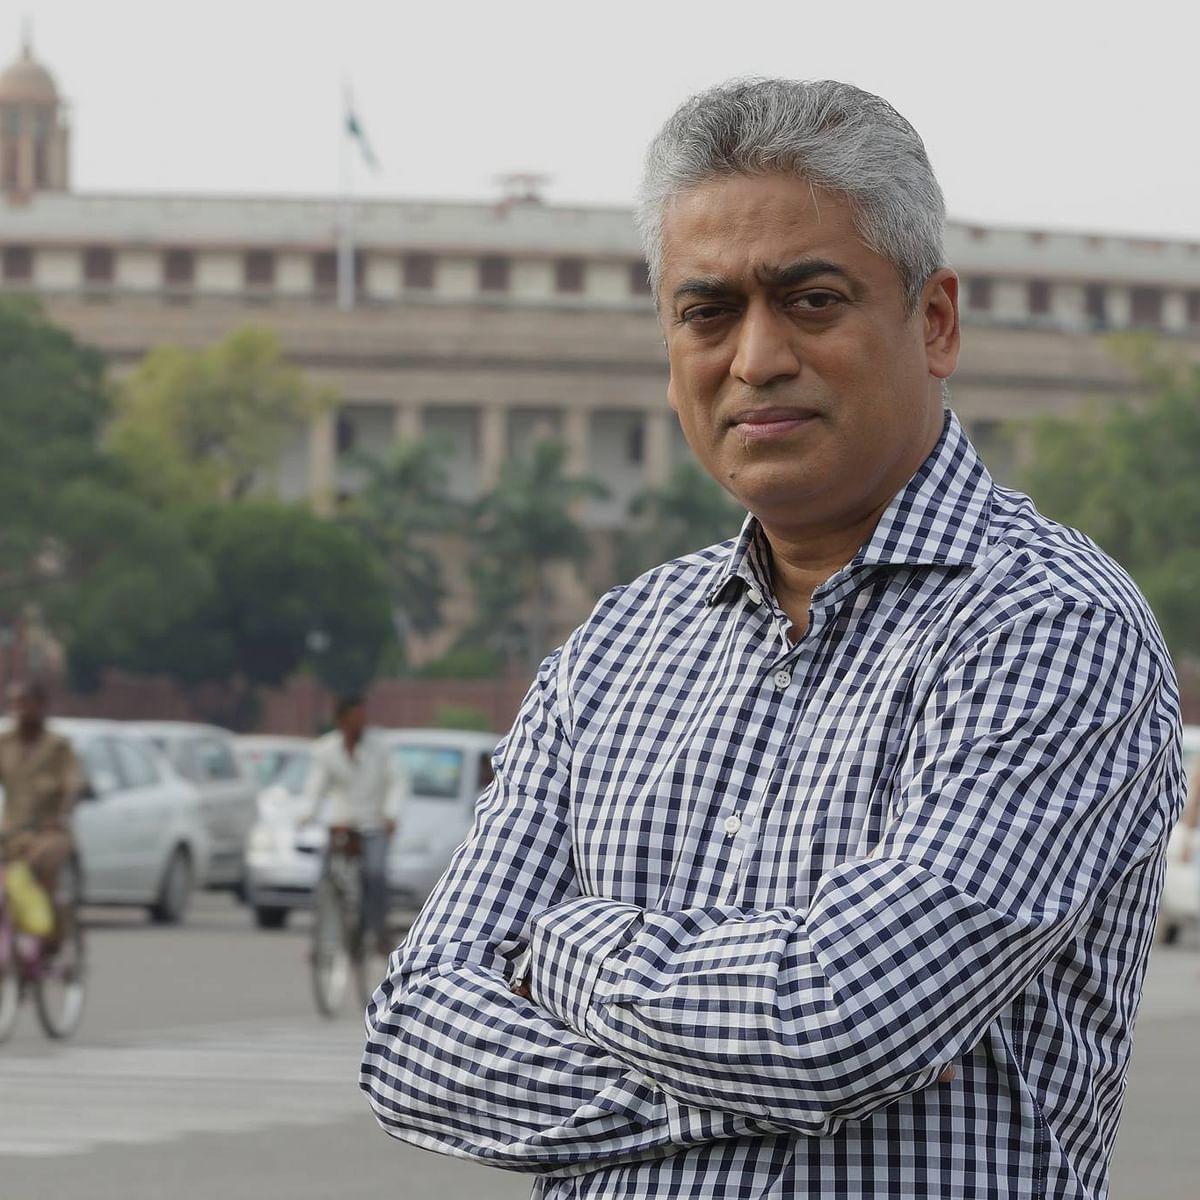 Contempt pe Contempt: Plea filed in SC against Rajdeep for tweets on Prashant Bhushan case